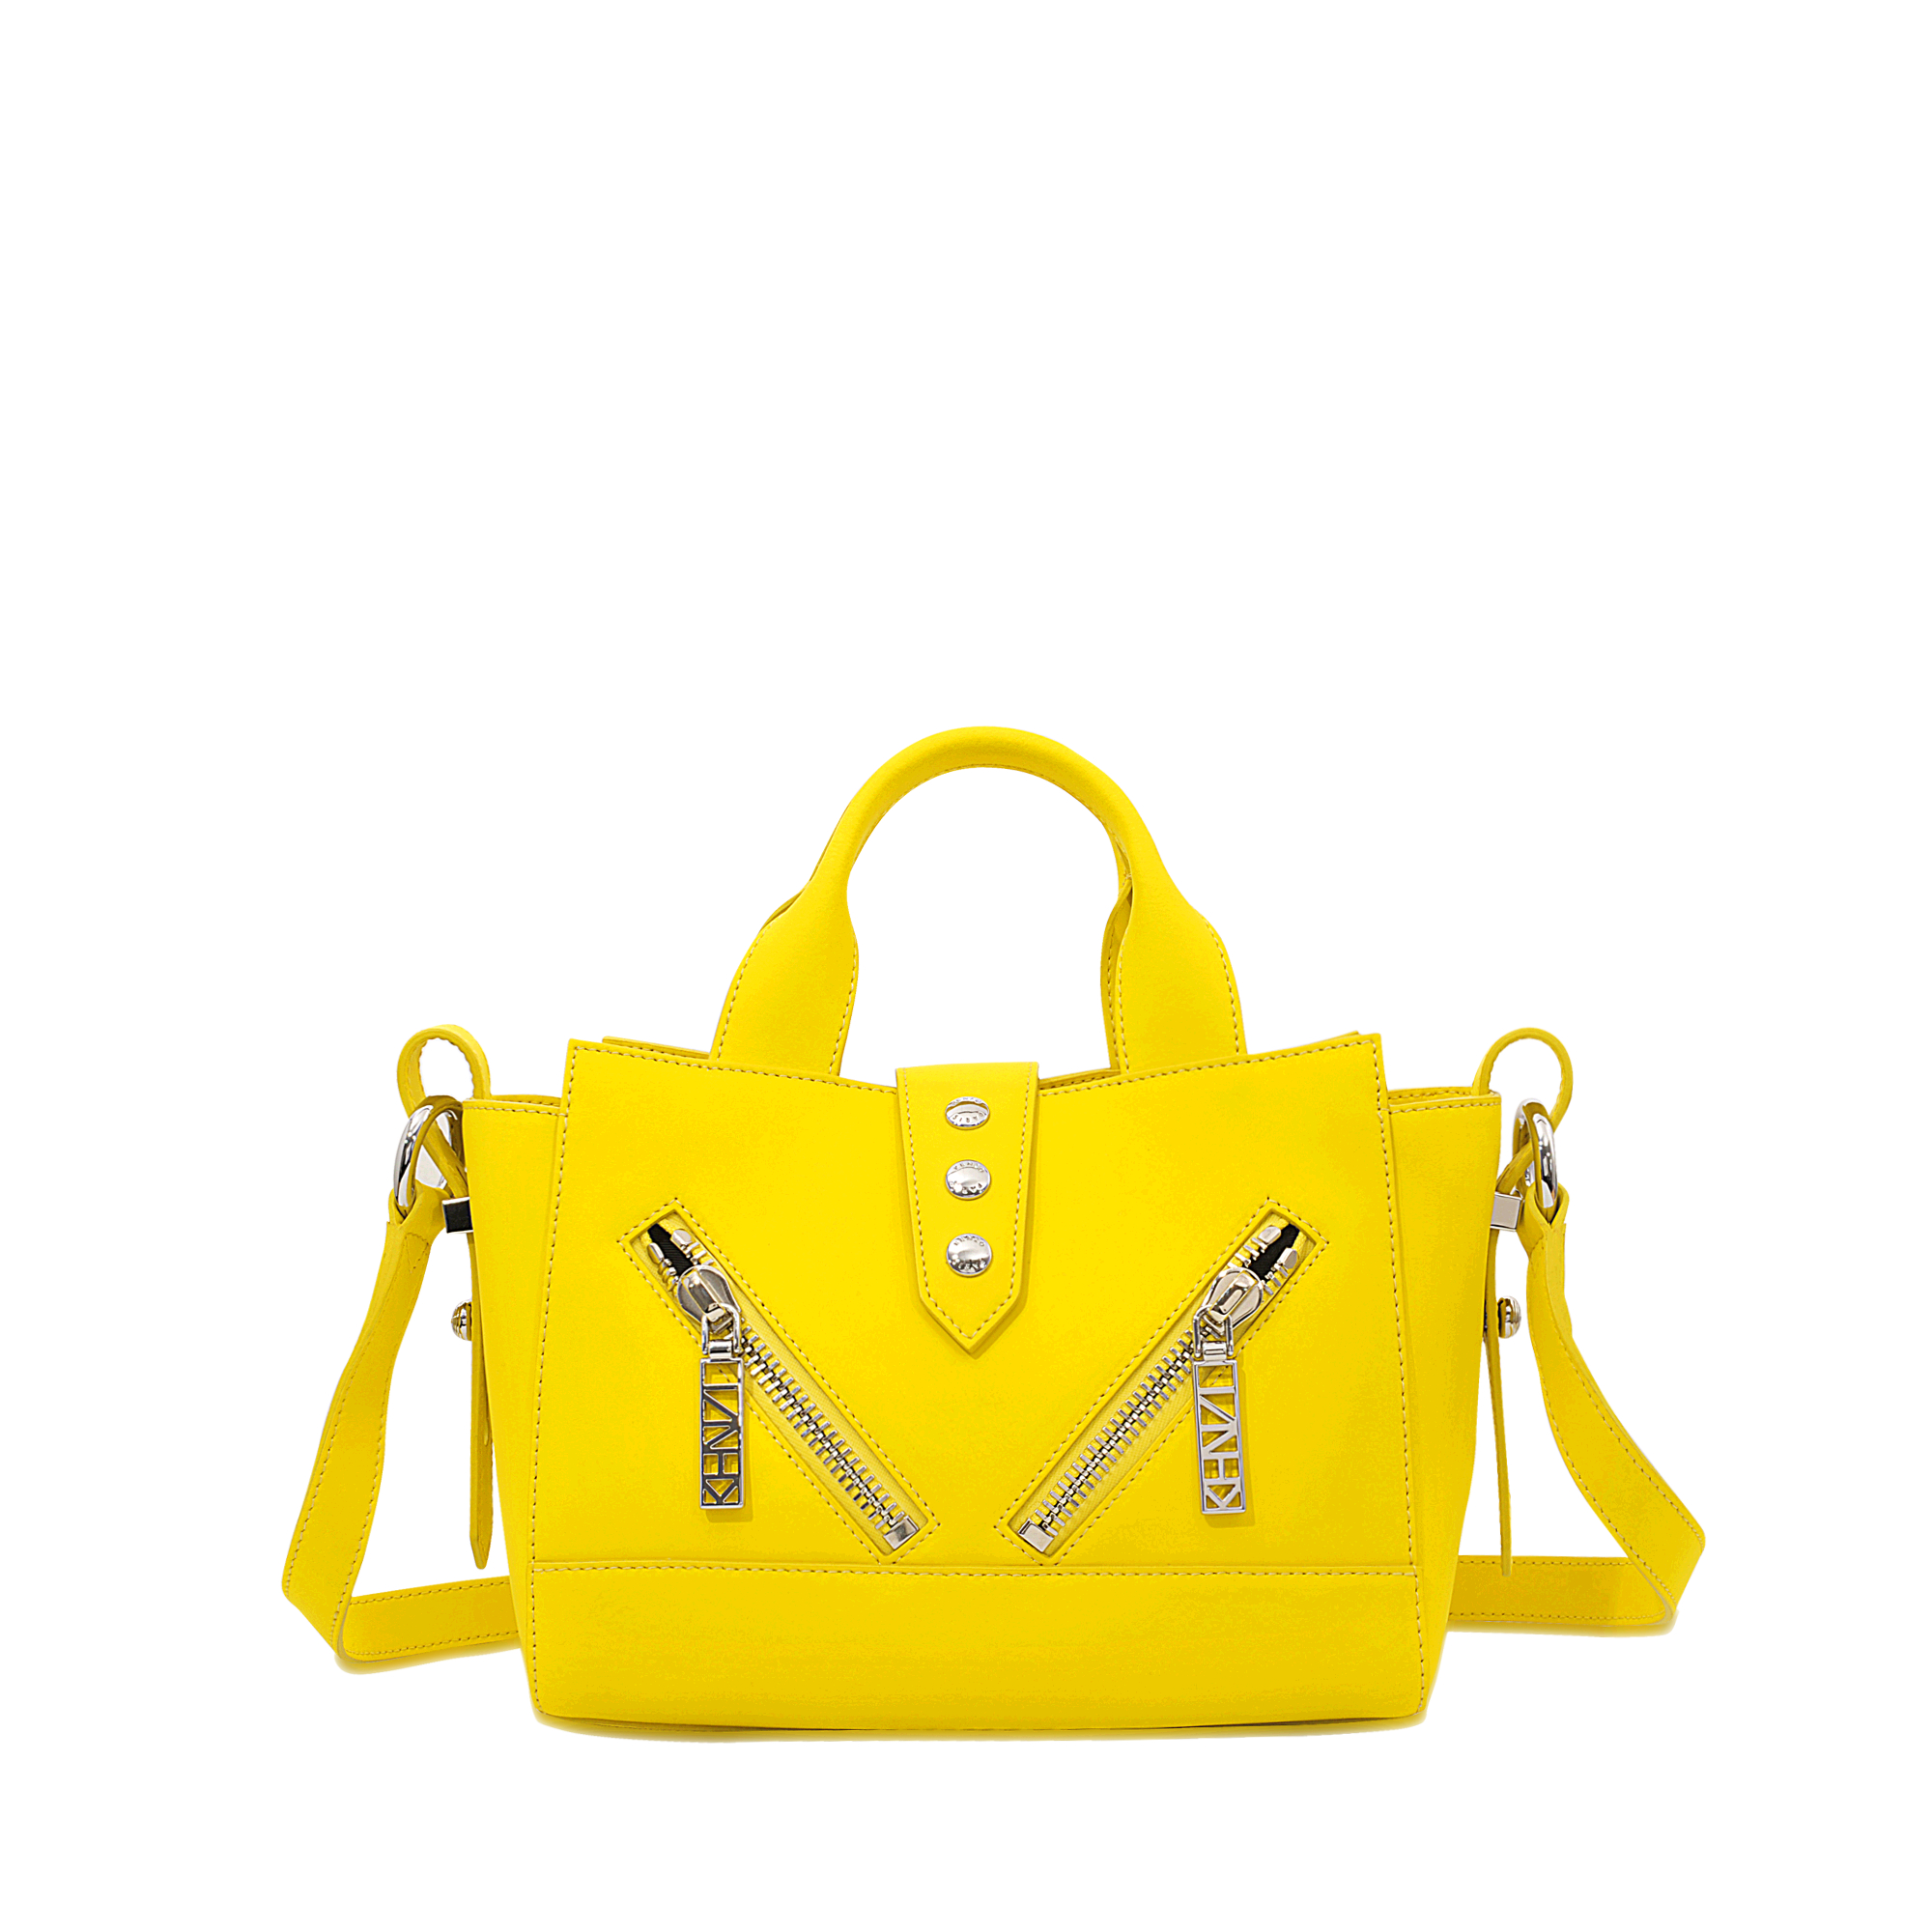 KENZO Leather Yellow Mini Kalifornia Bag